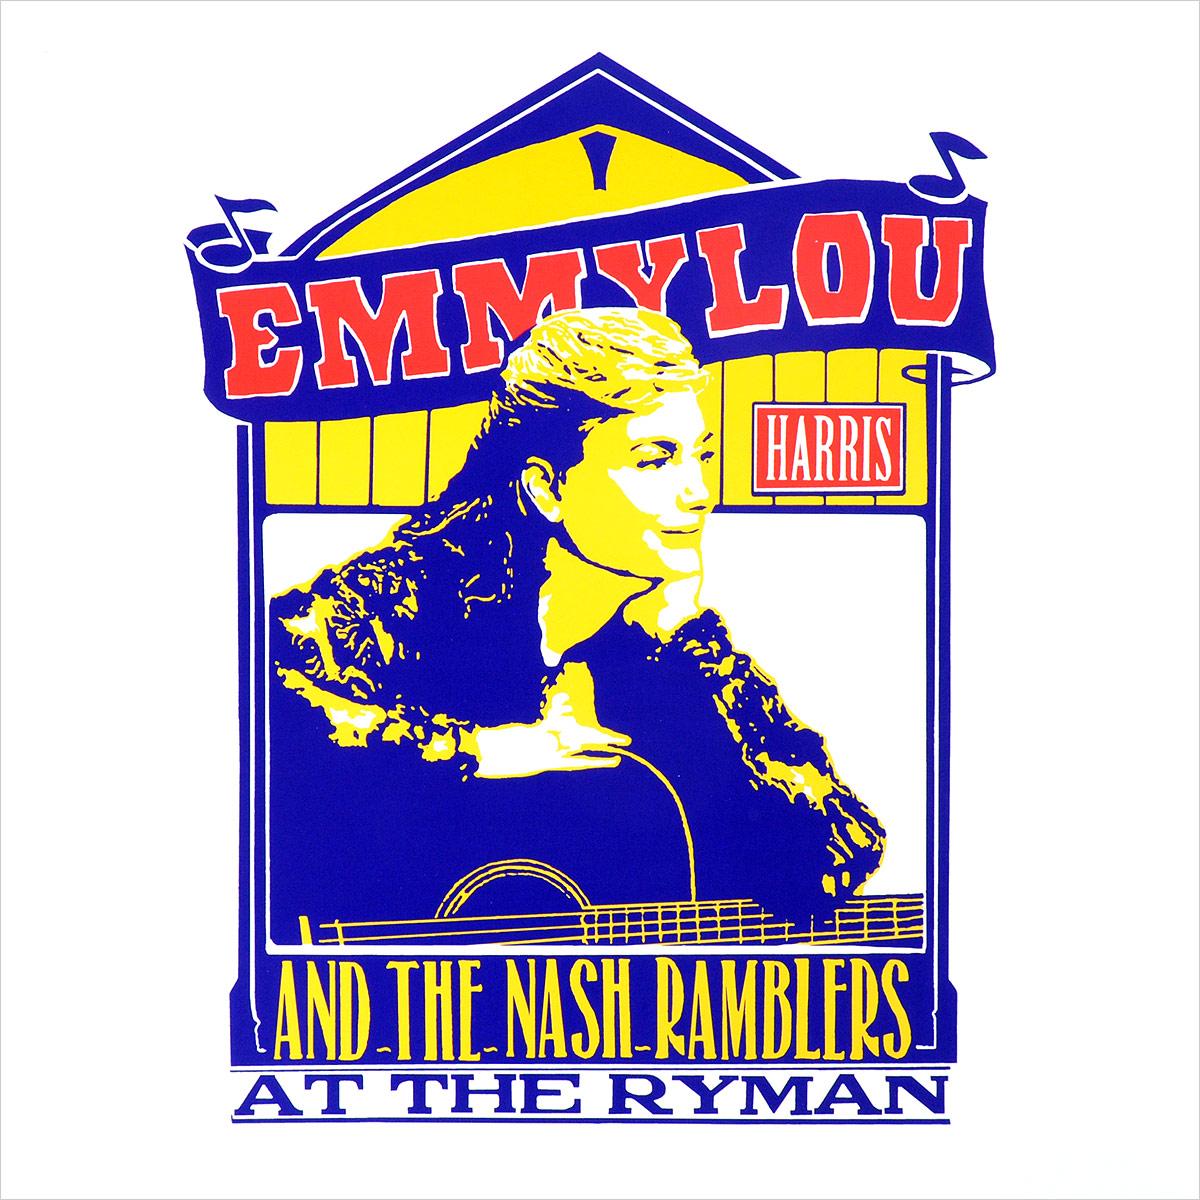 лучшая цена Эммилу Харрис,The Nash Ramblers Emmylou Harris And The Nash Ramblers. At The Ryman (2 LP)